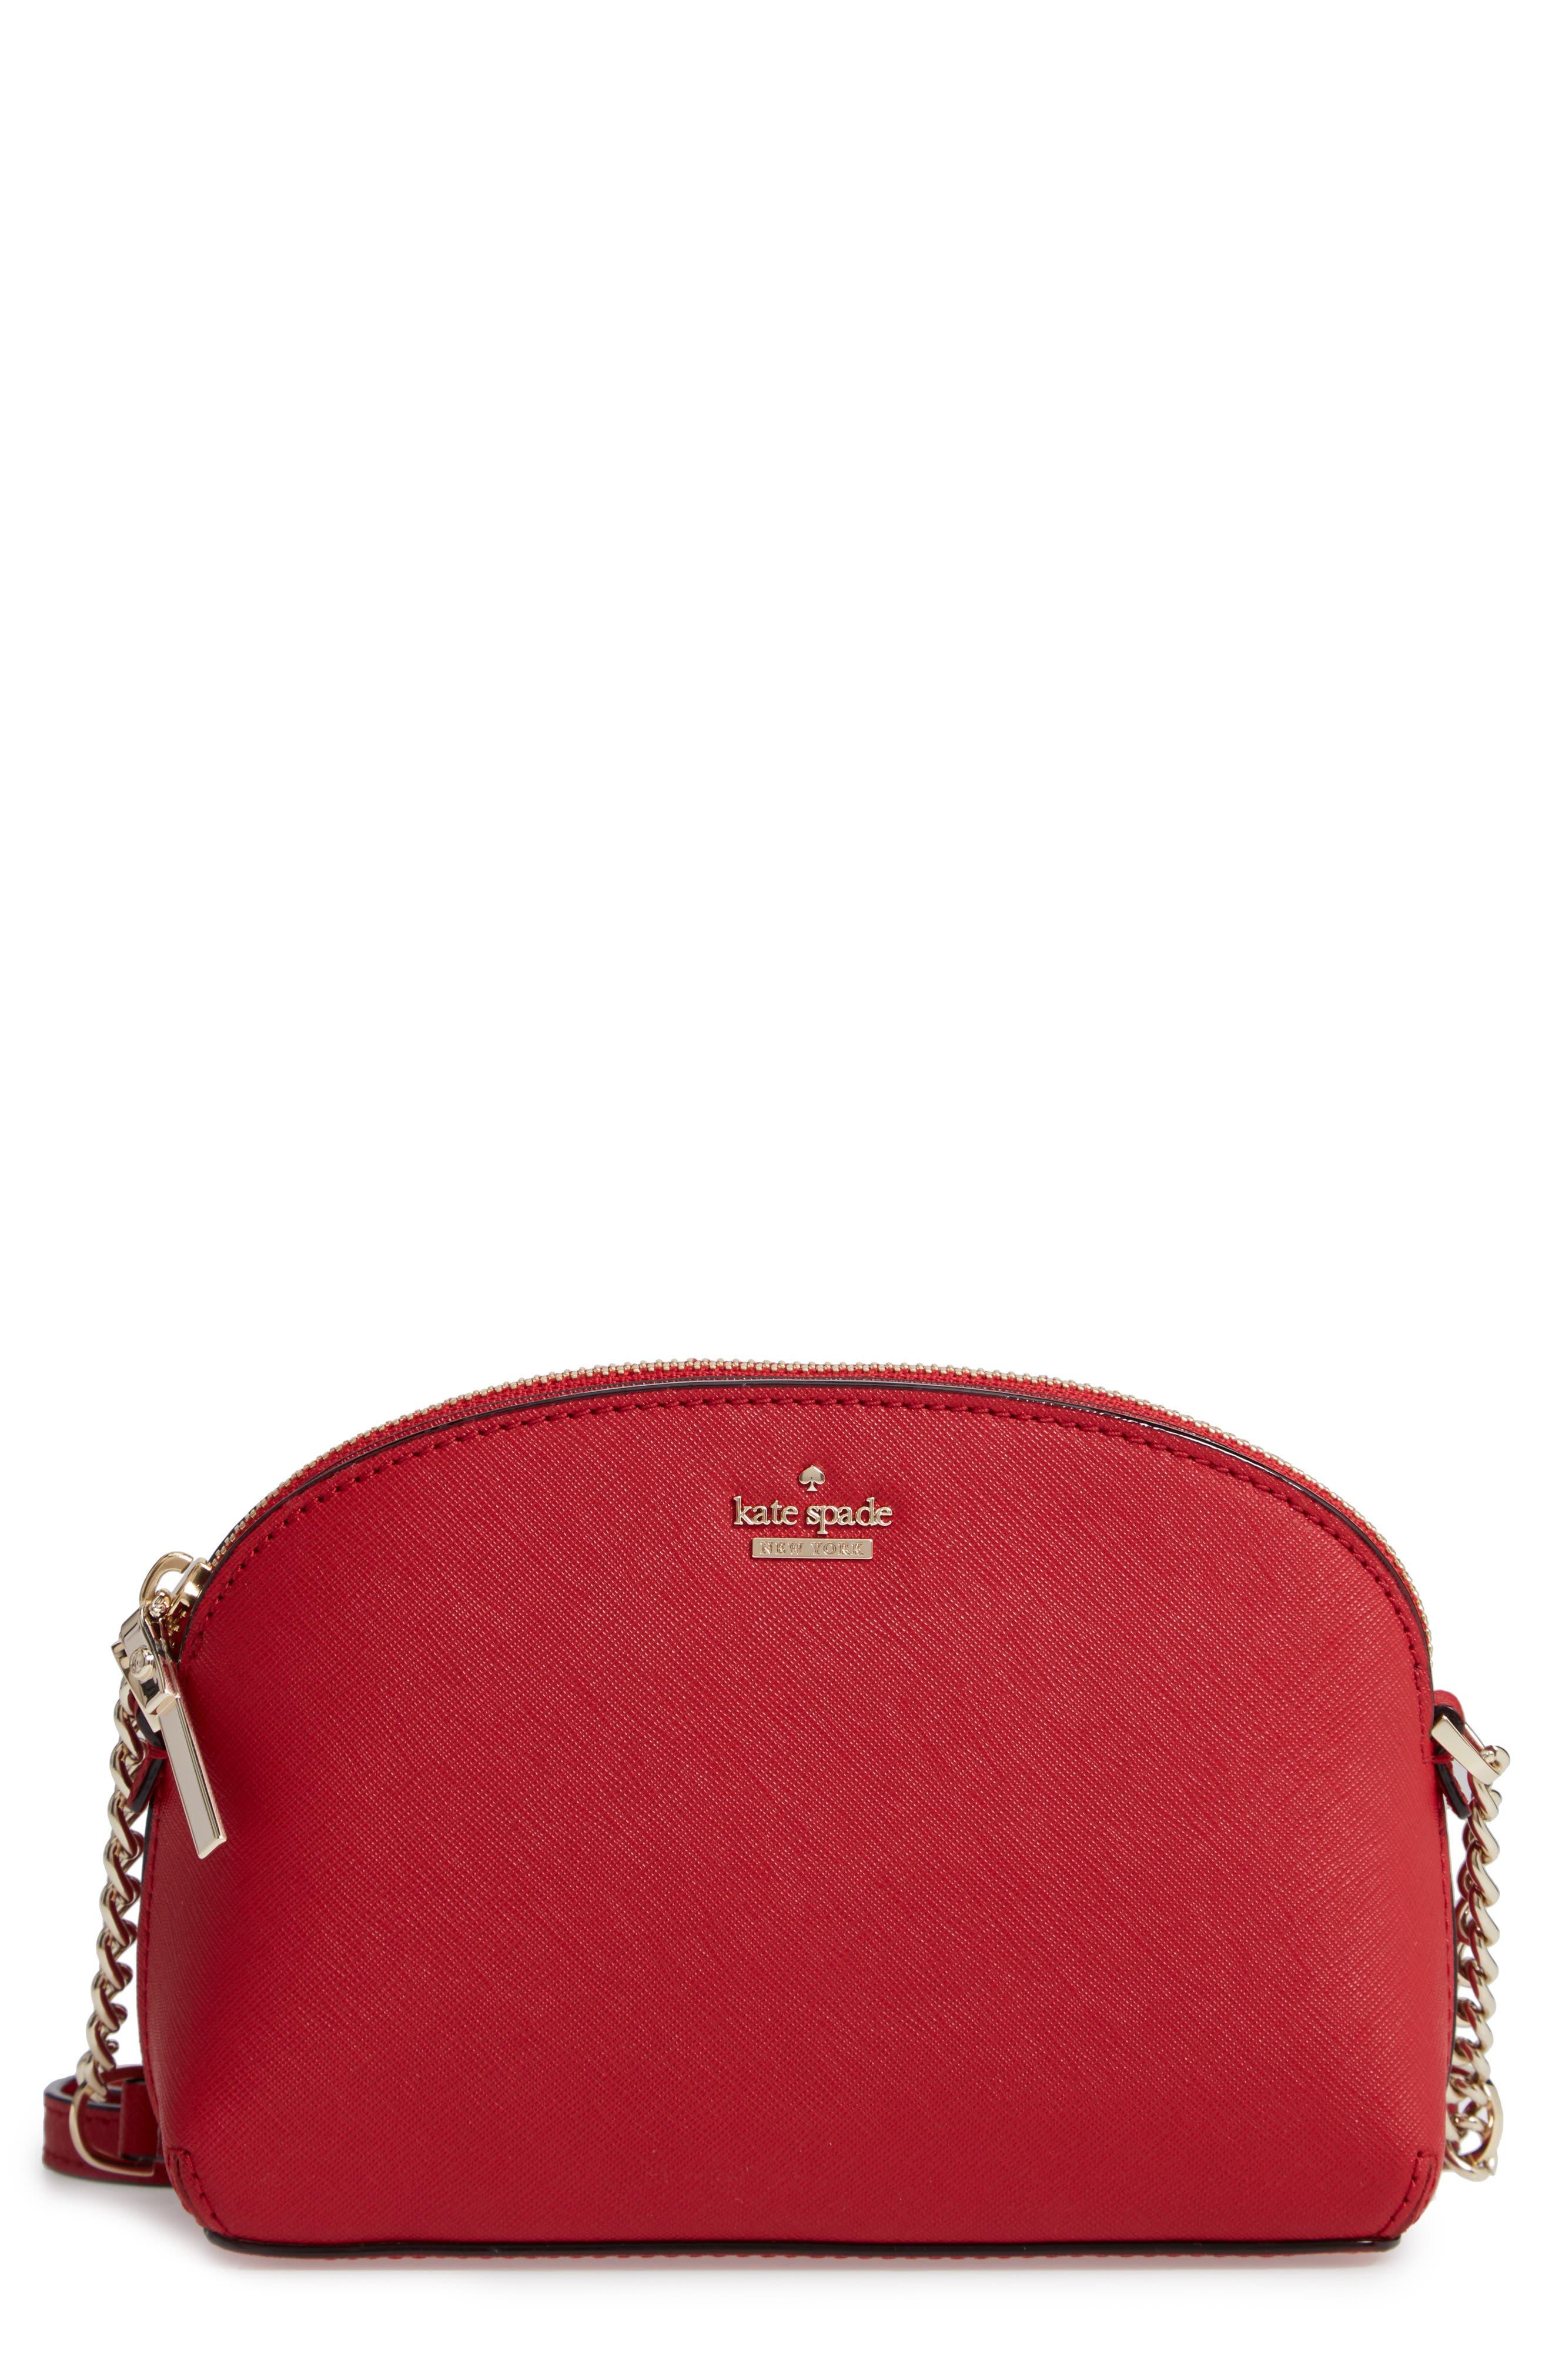 cameron street - hilli leather crossbody bag,                             Main thumbnail 1, color,                             600